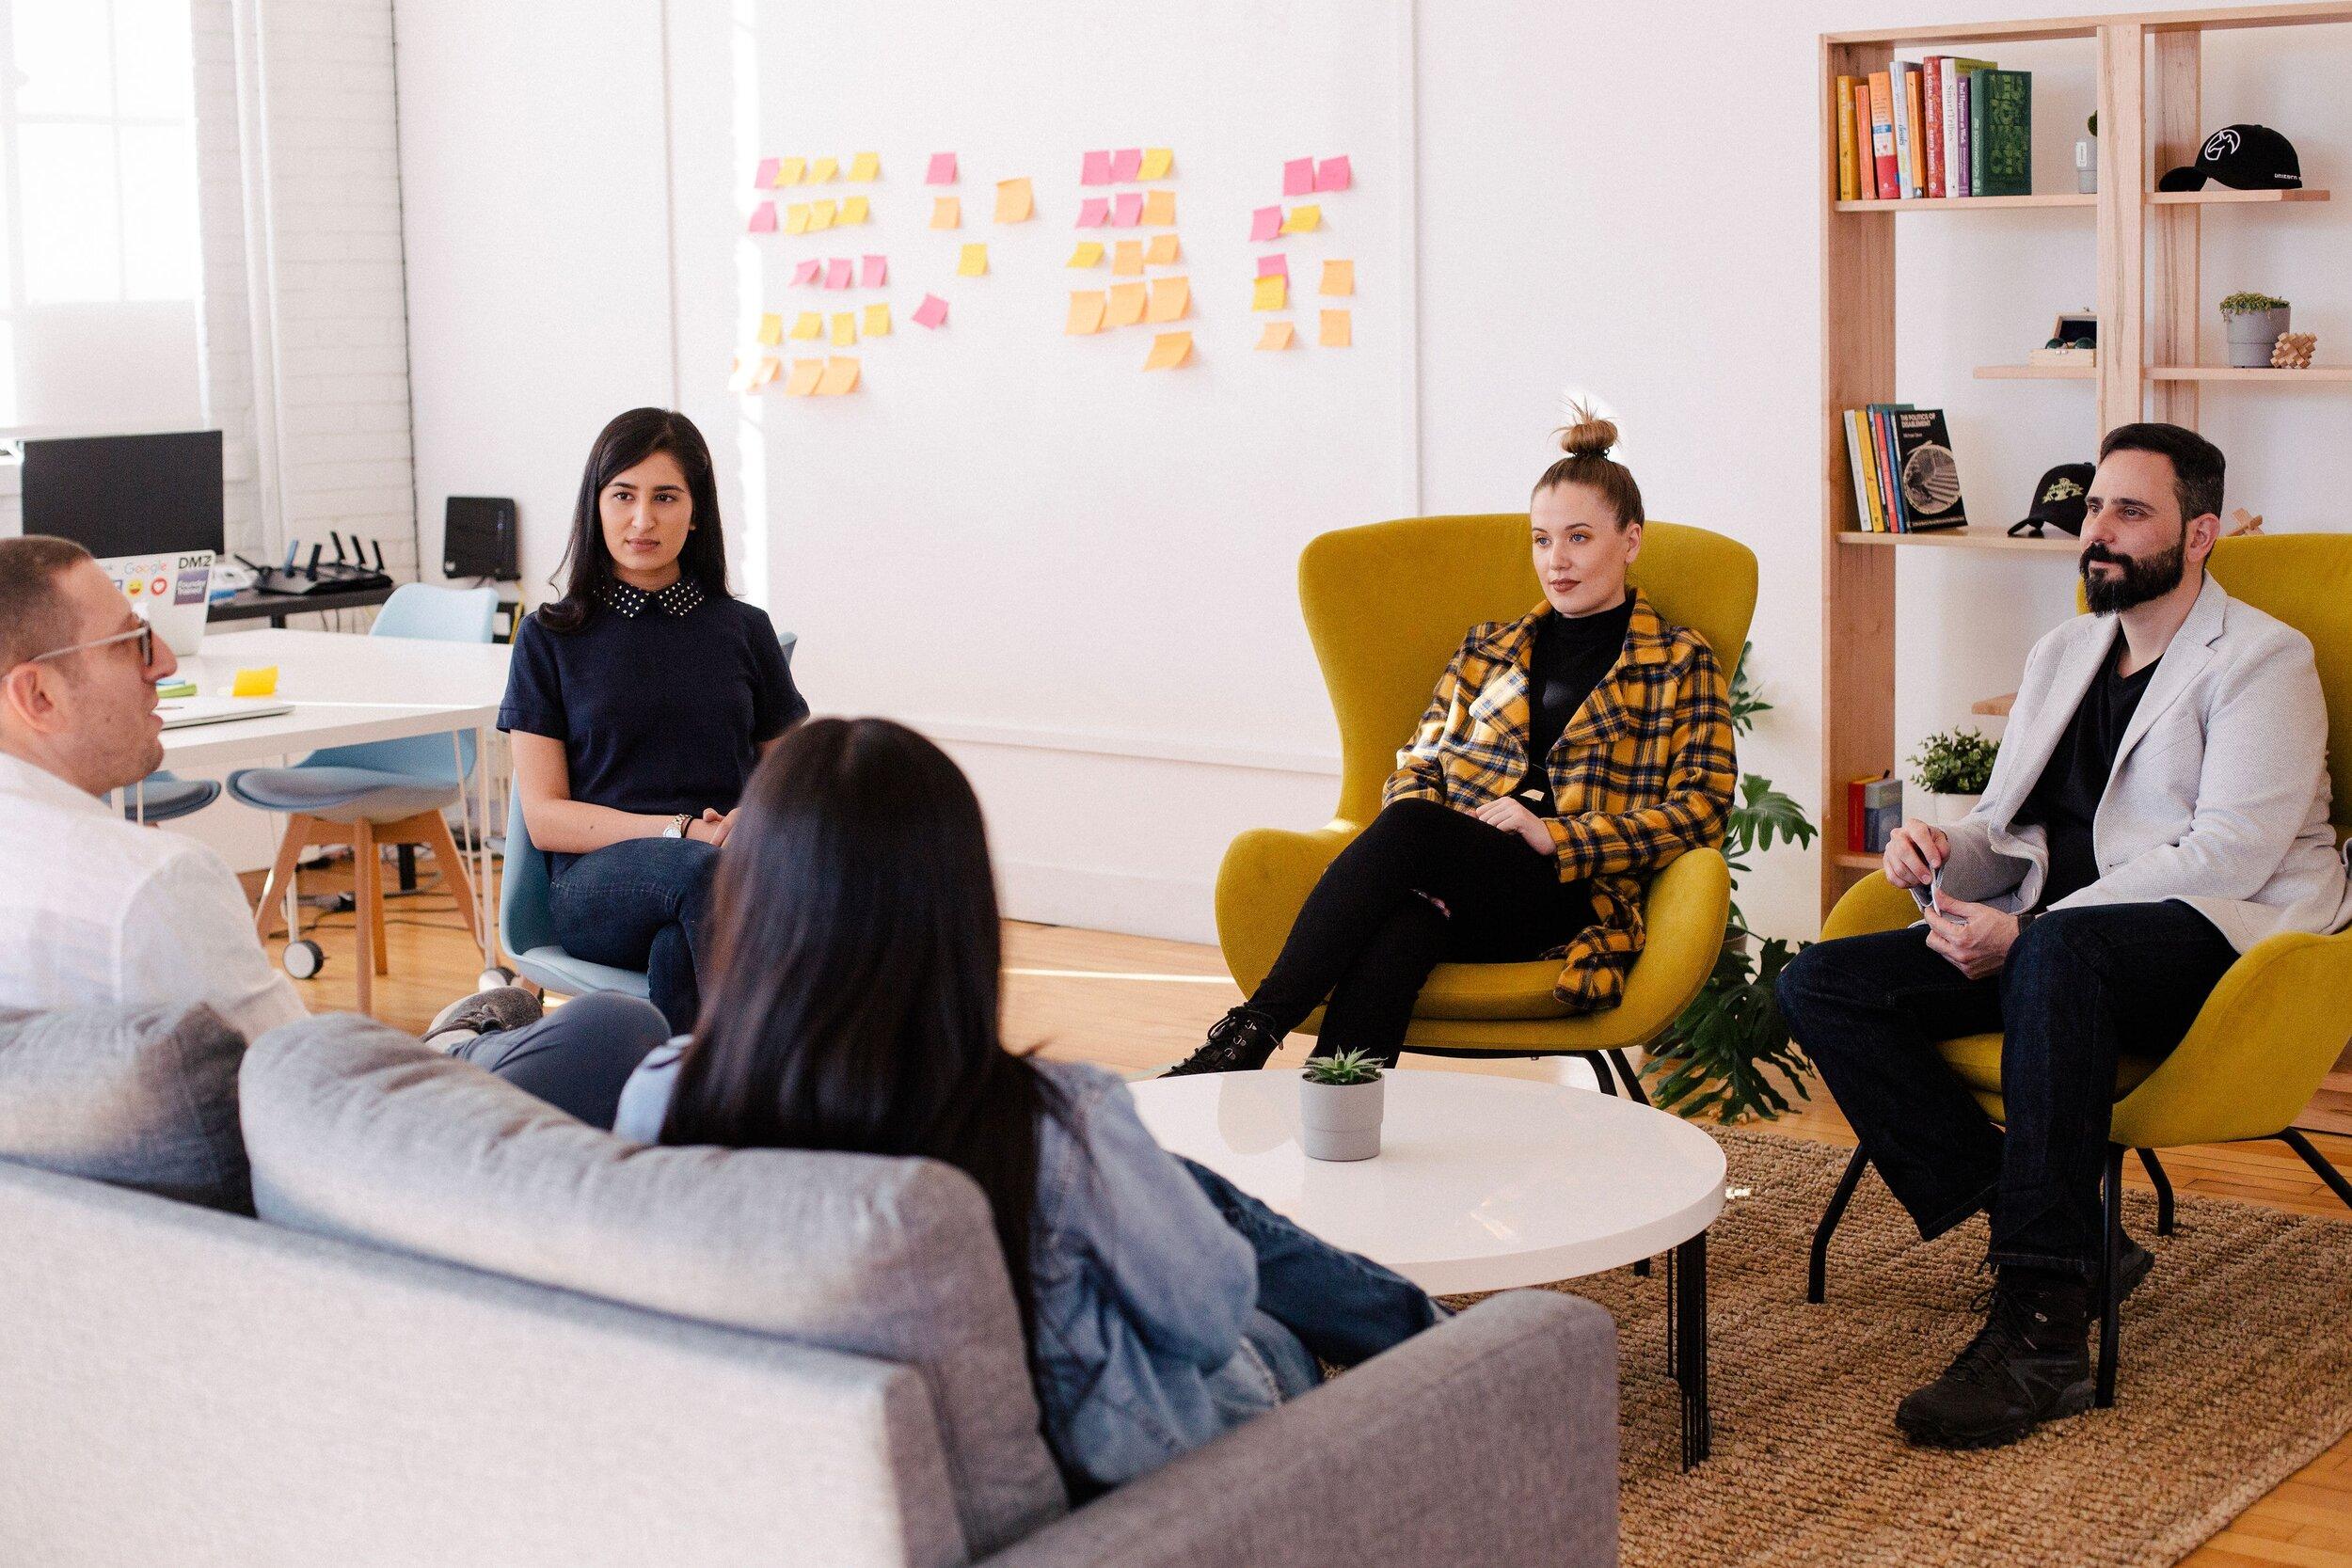 teamwork-training-leadership-coaching-Minneapolis-businesses.jpg